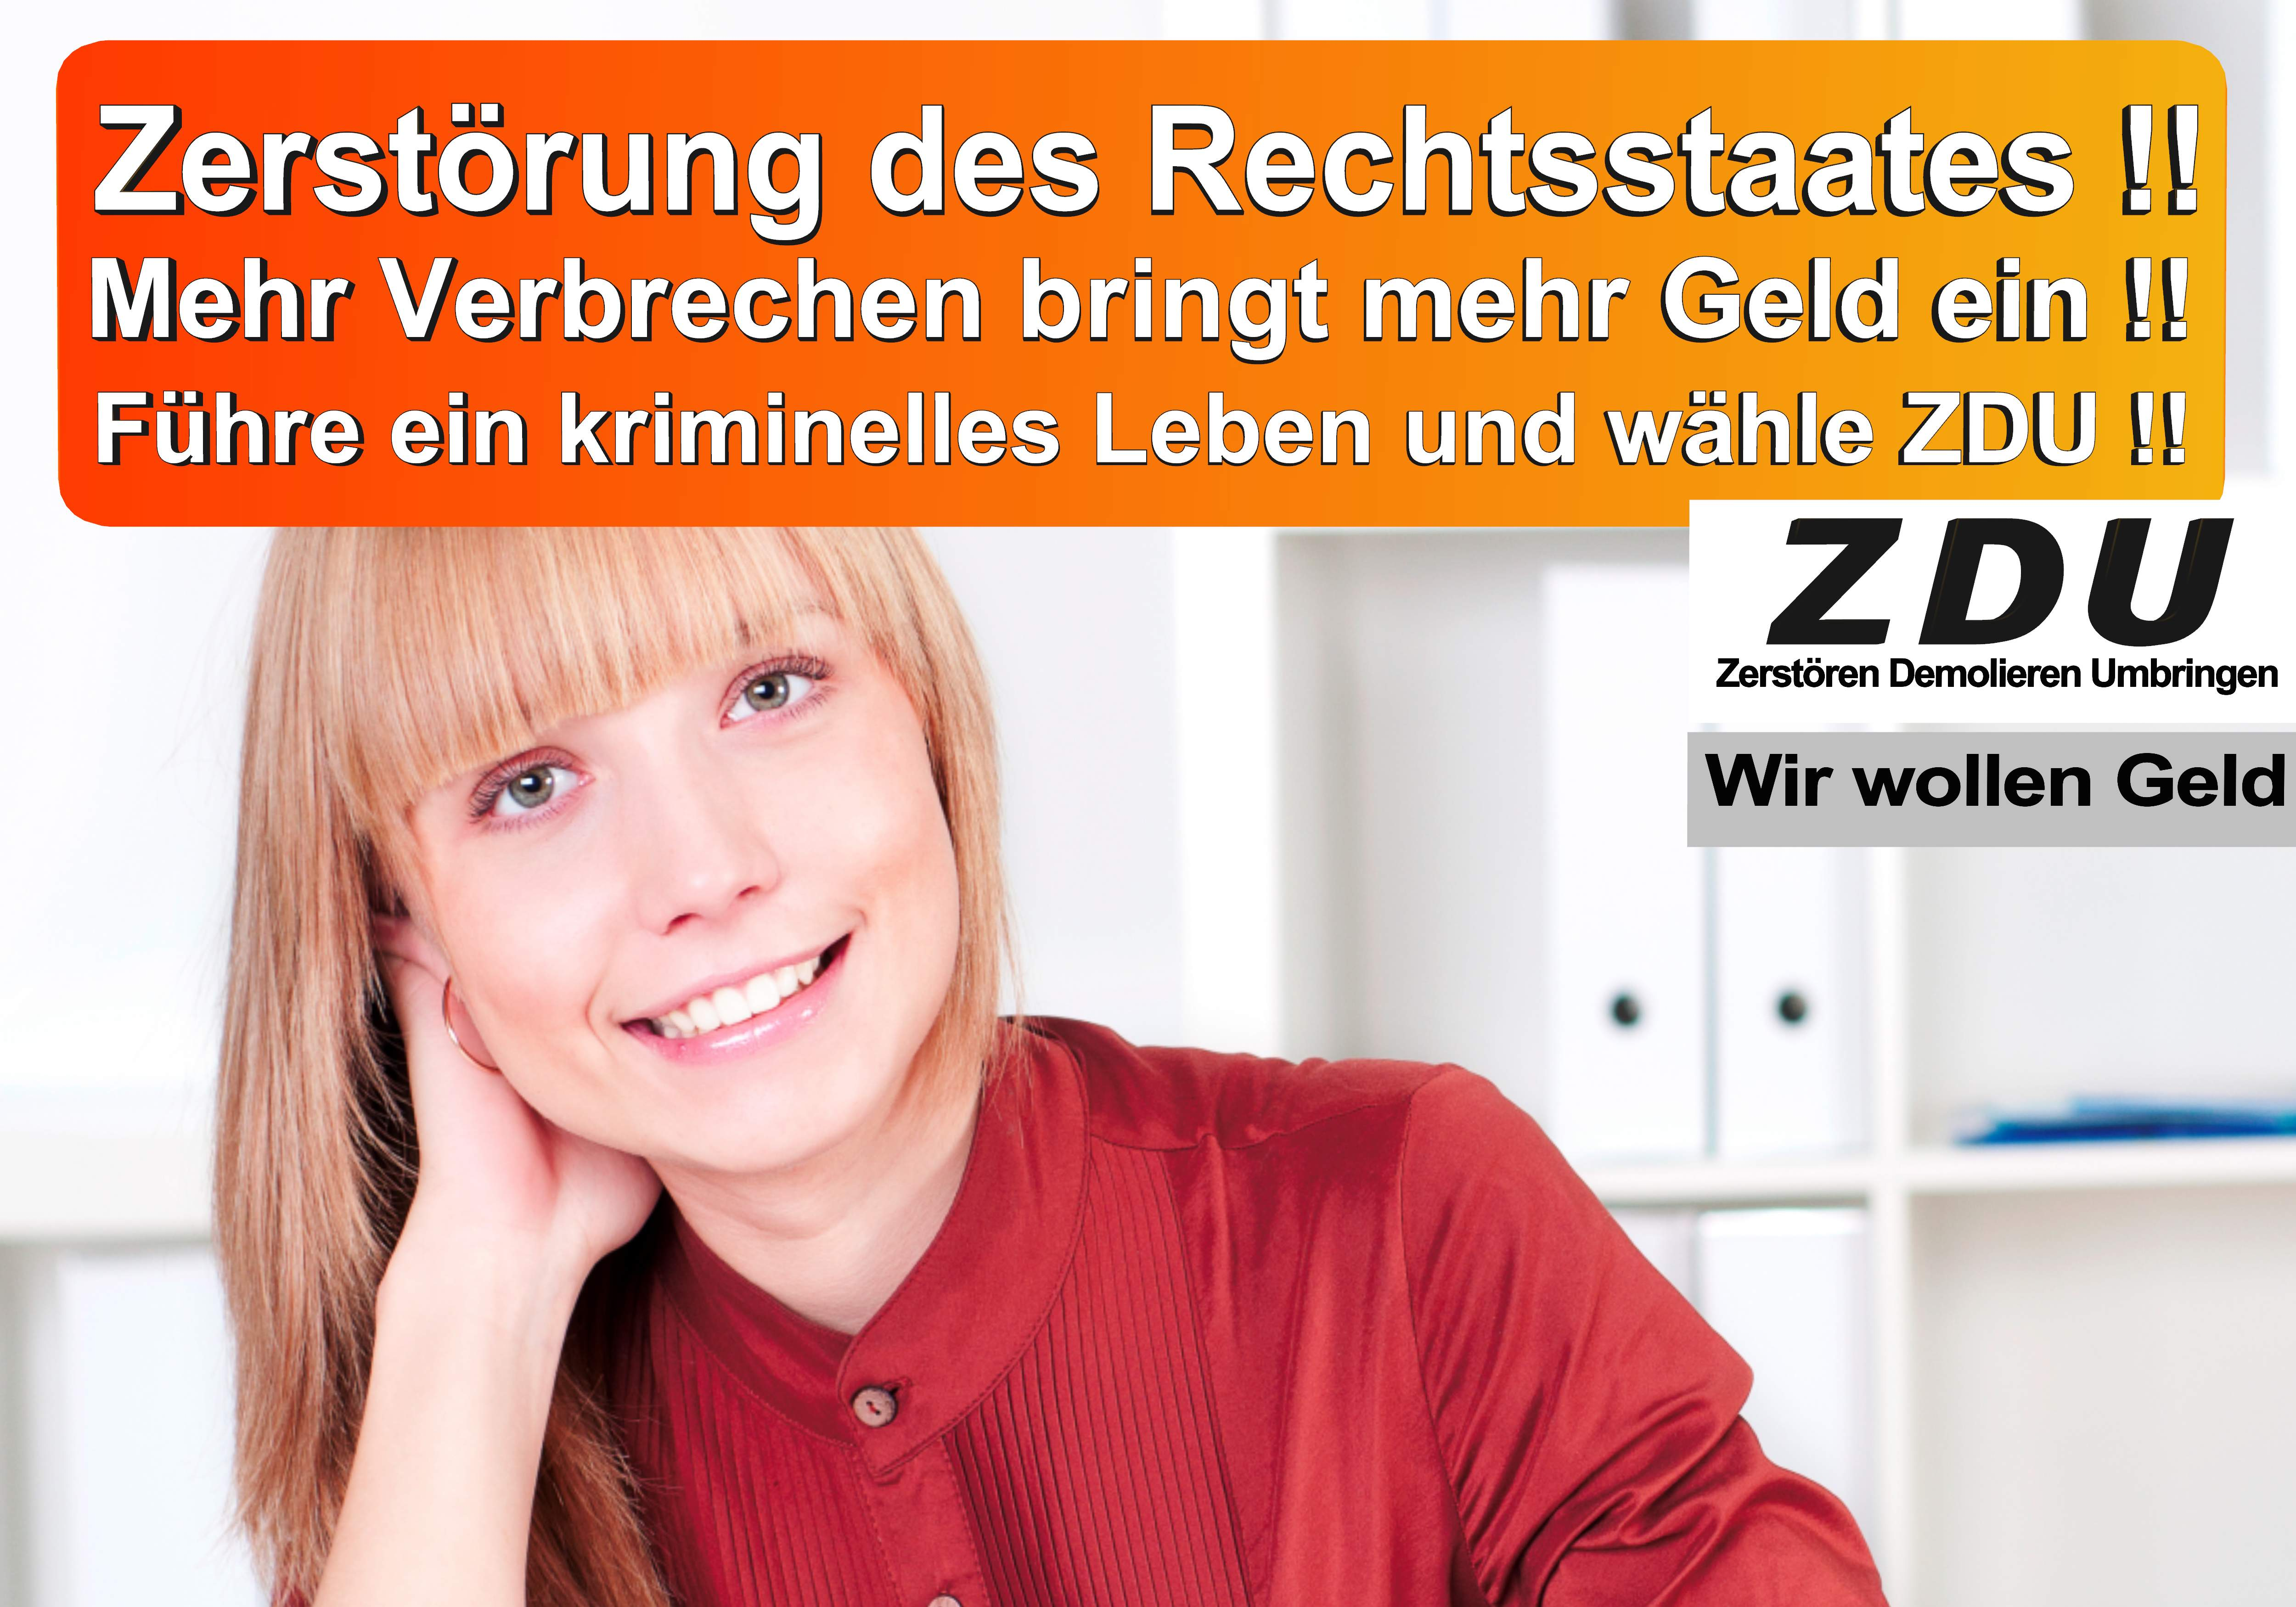 Bundestagswahl 2017 CDU SPD AfD Wahlplakat Angela Merkel CDU CSU (24)